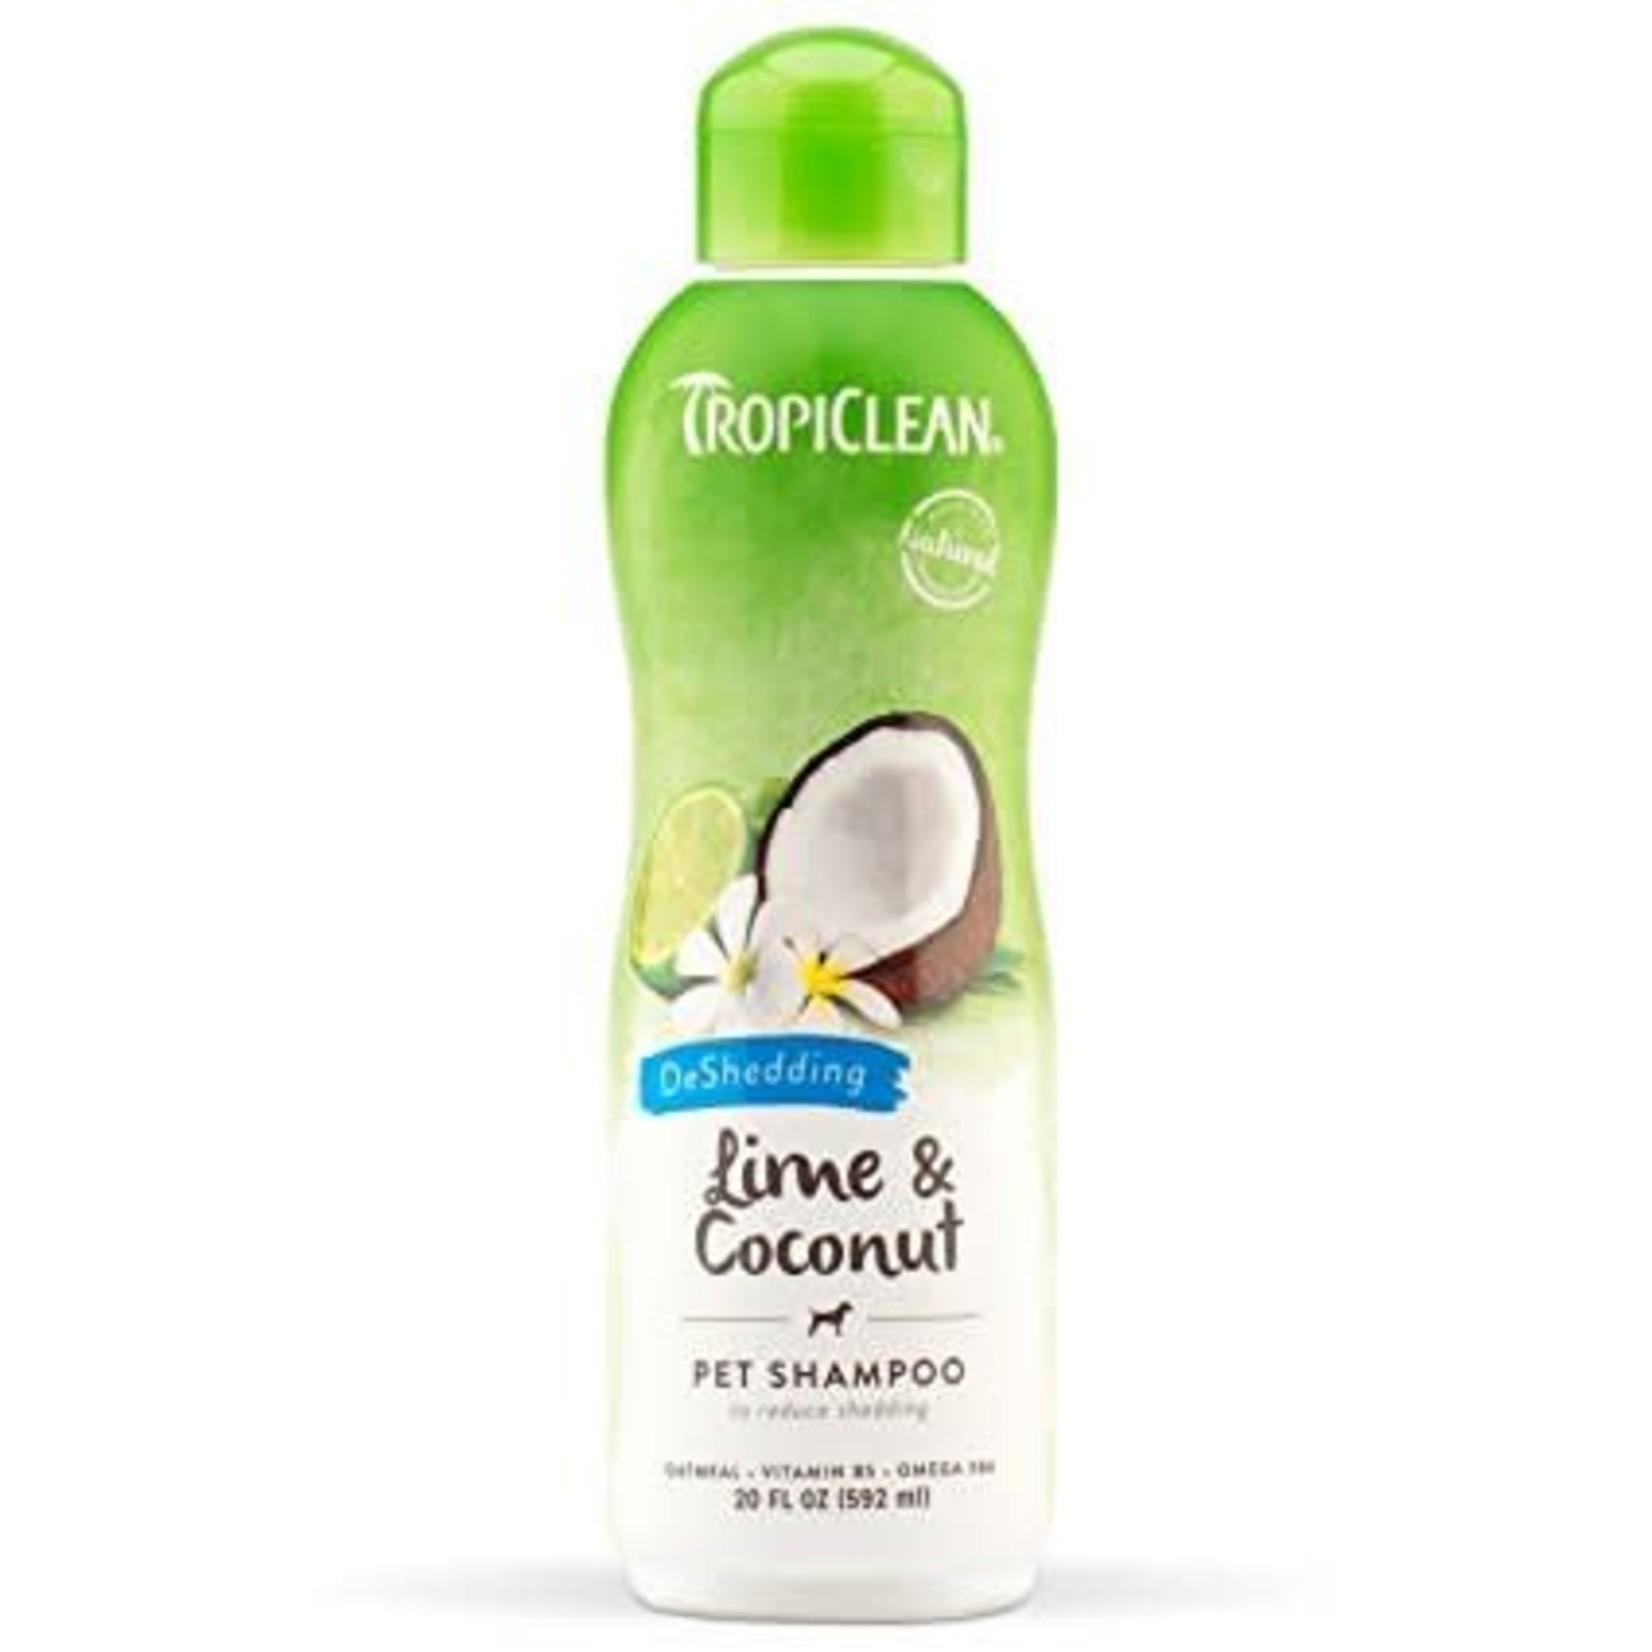 Tropiclean Lime and Coconut Deshedding Shampoo 20oz